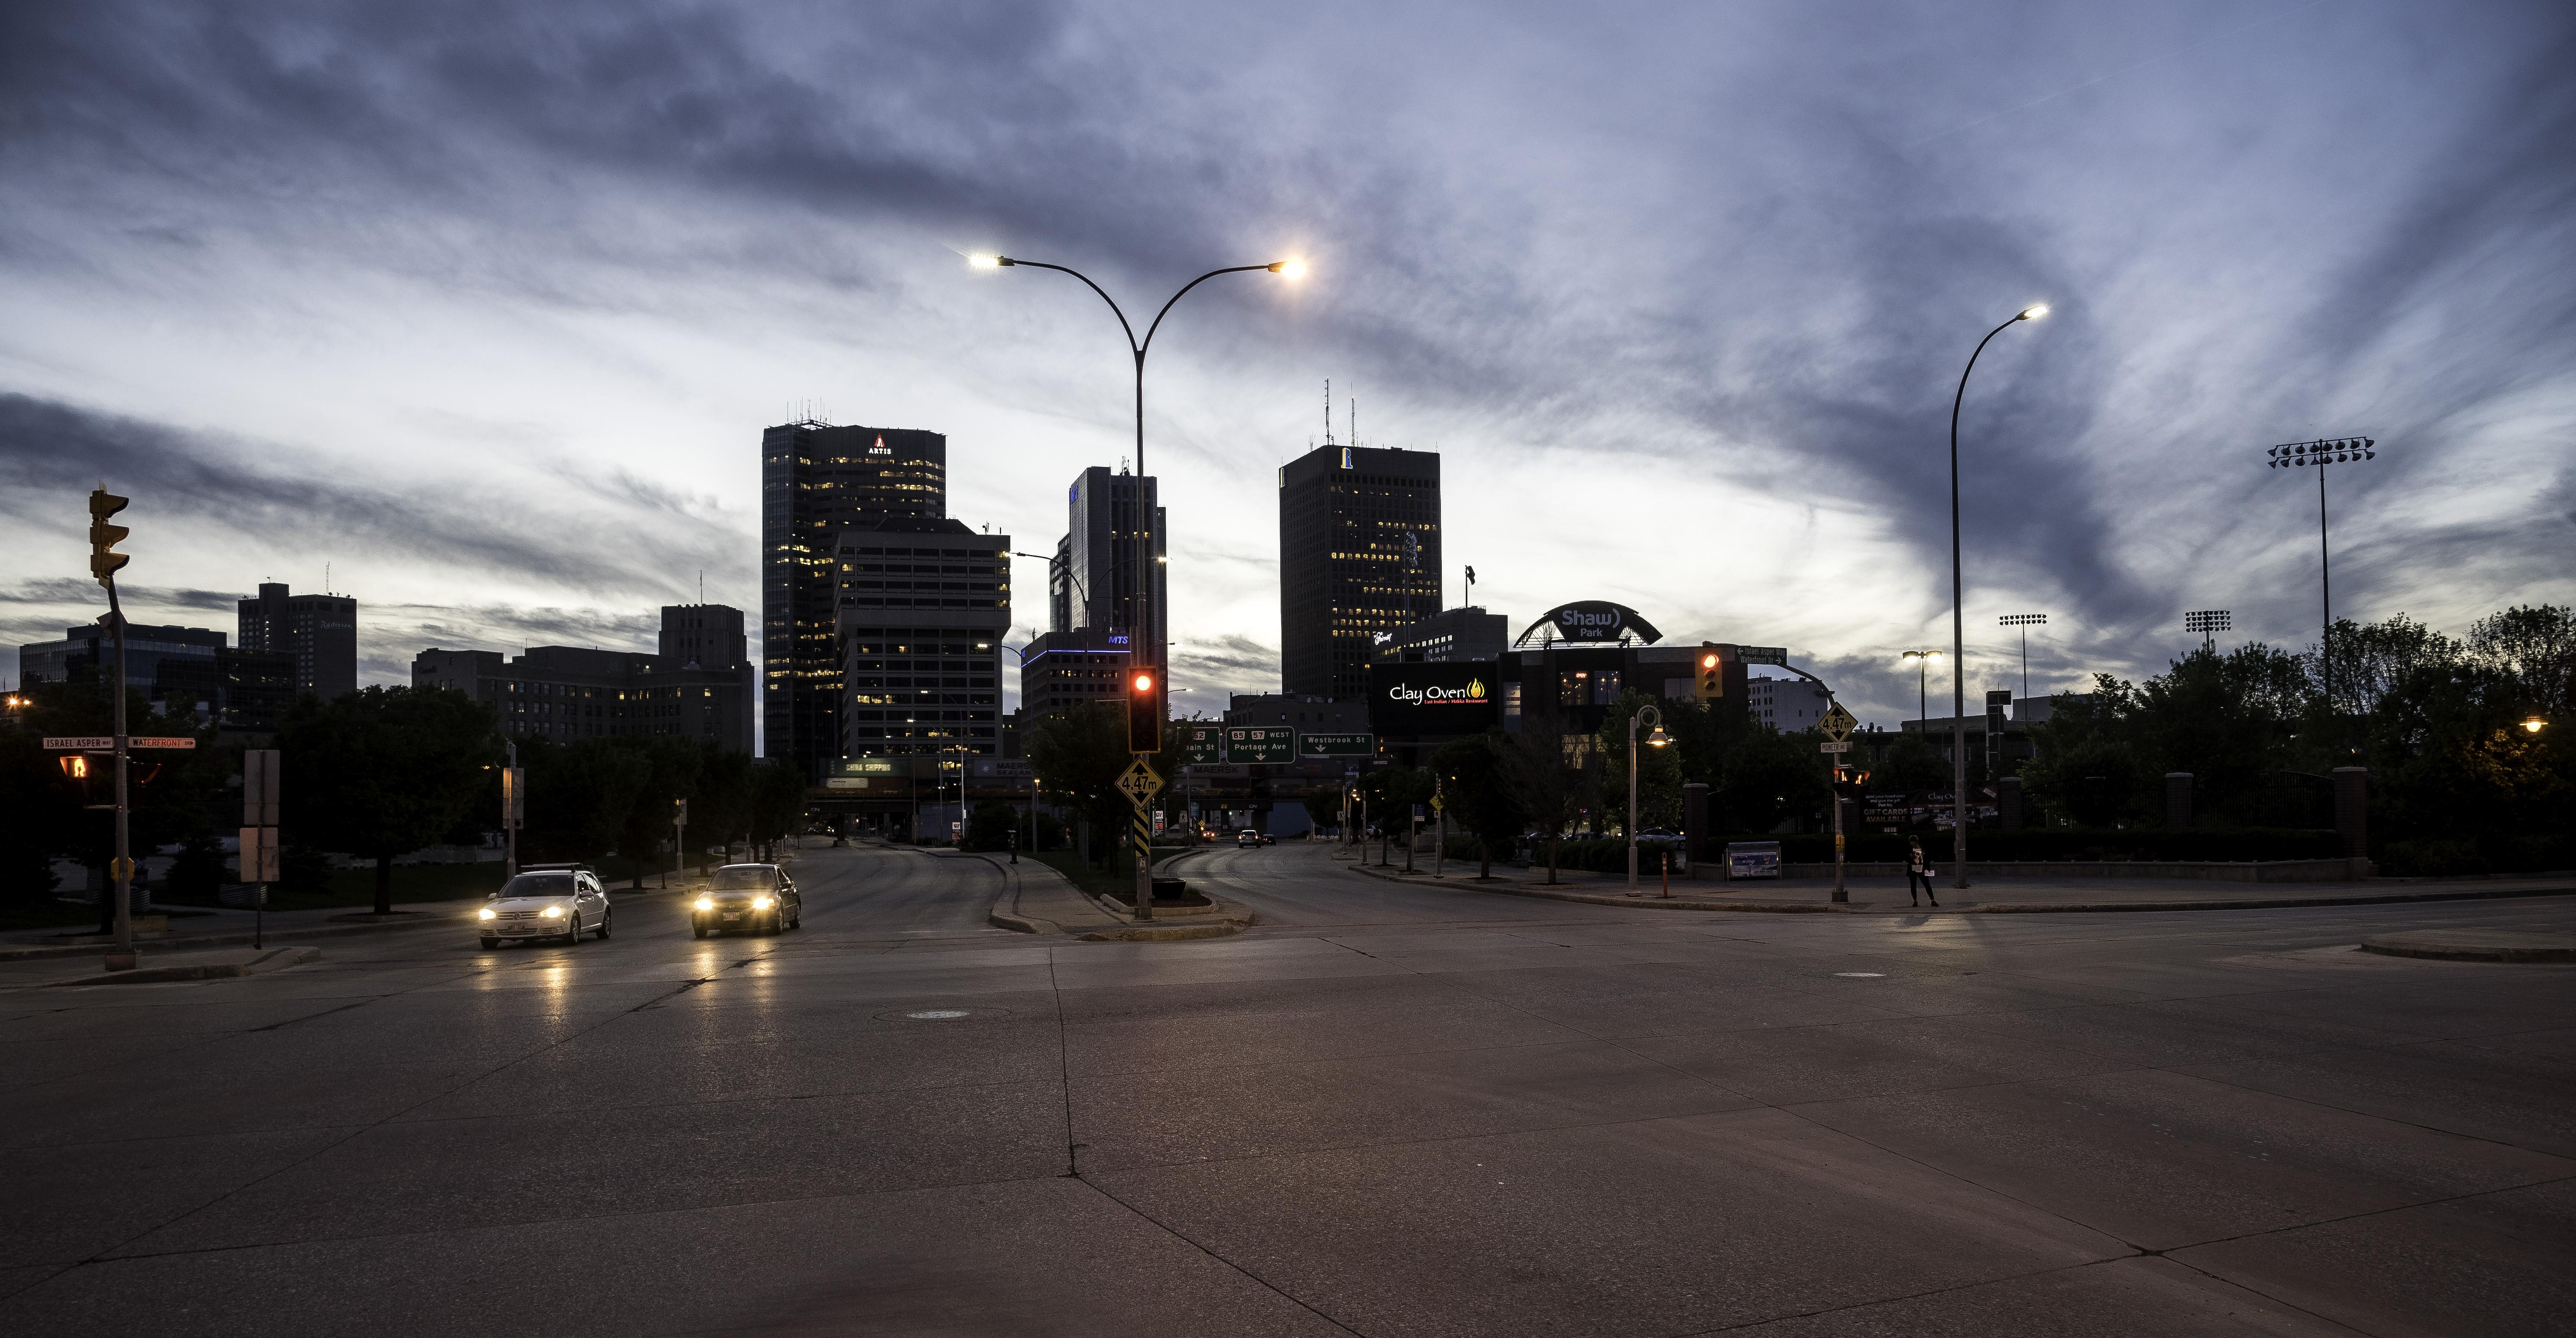 Skyline Of Winnipeg At Night Image Free Stock Photo